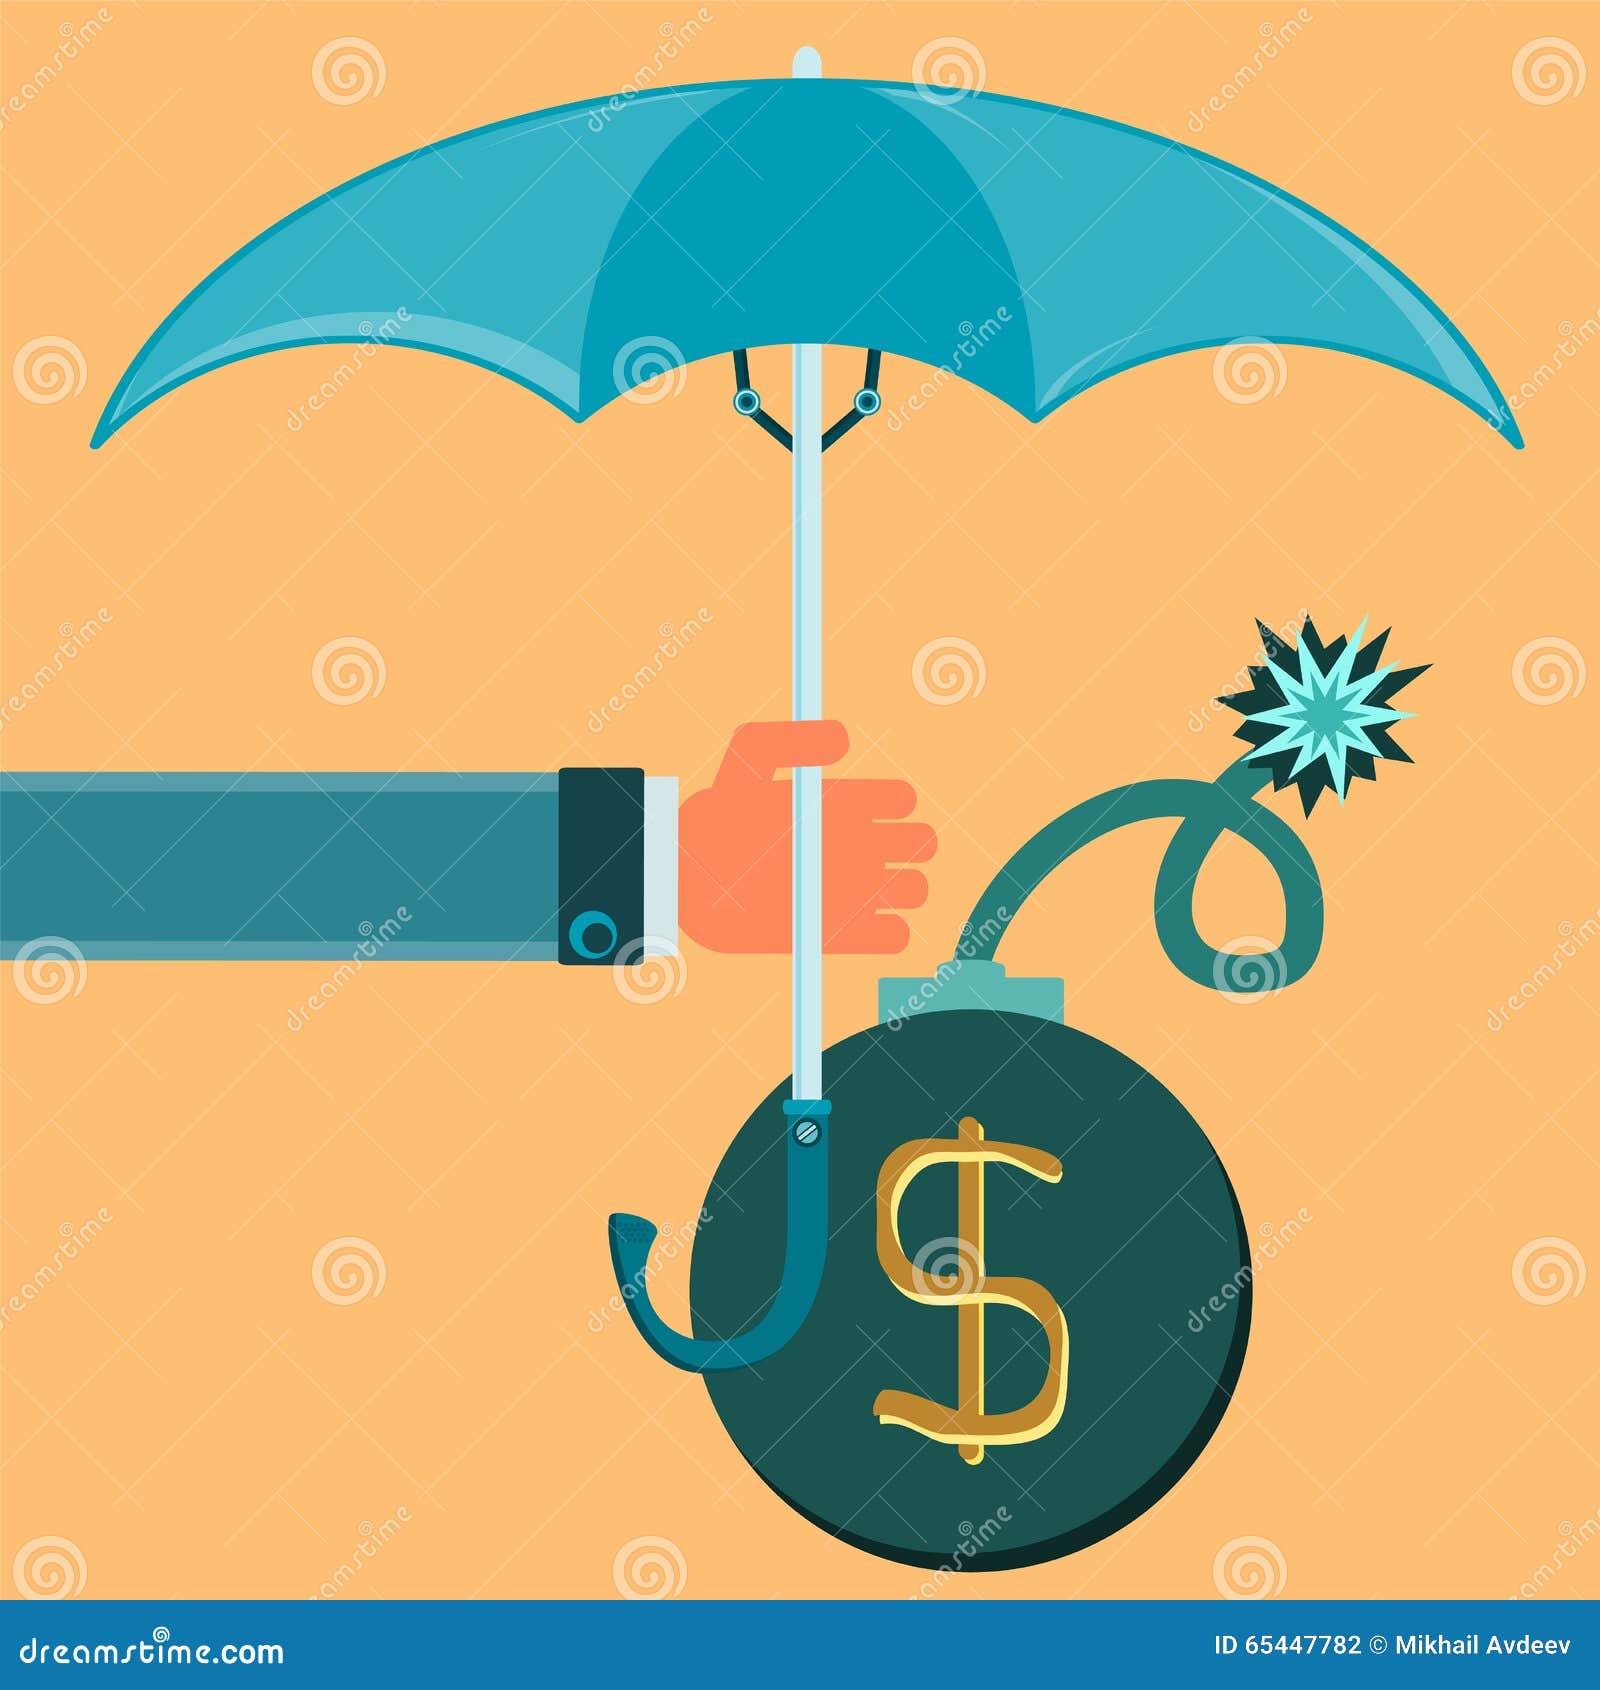 Bomb with burning wick under the umbrella.